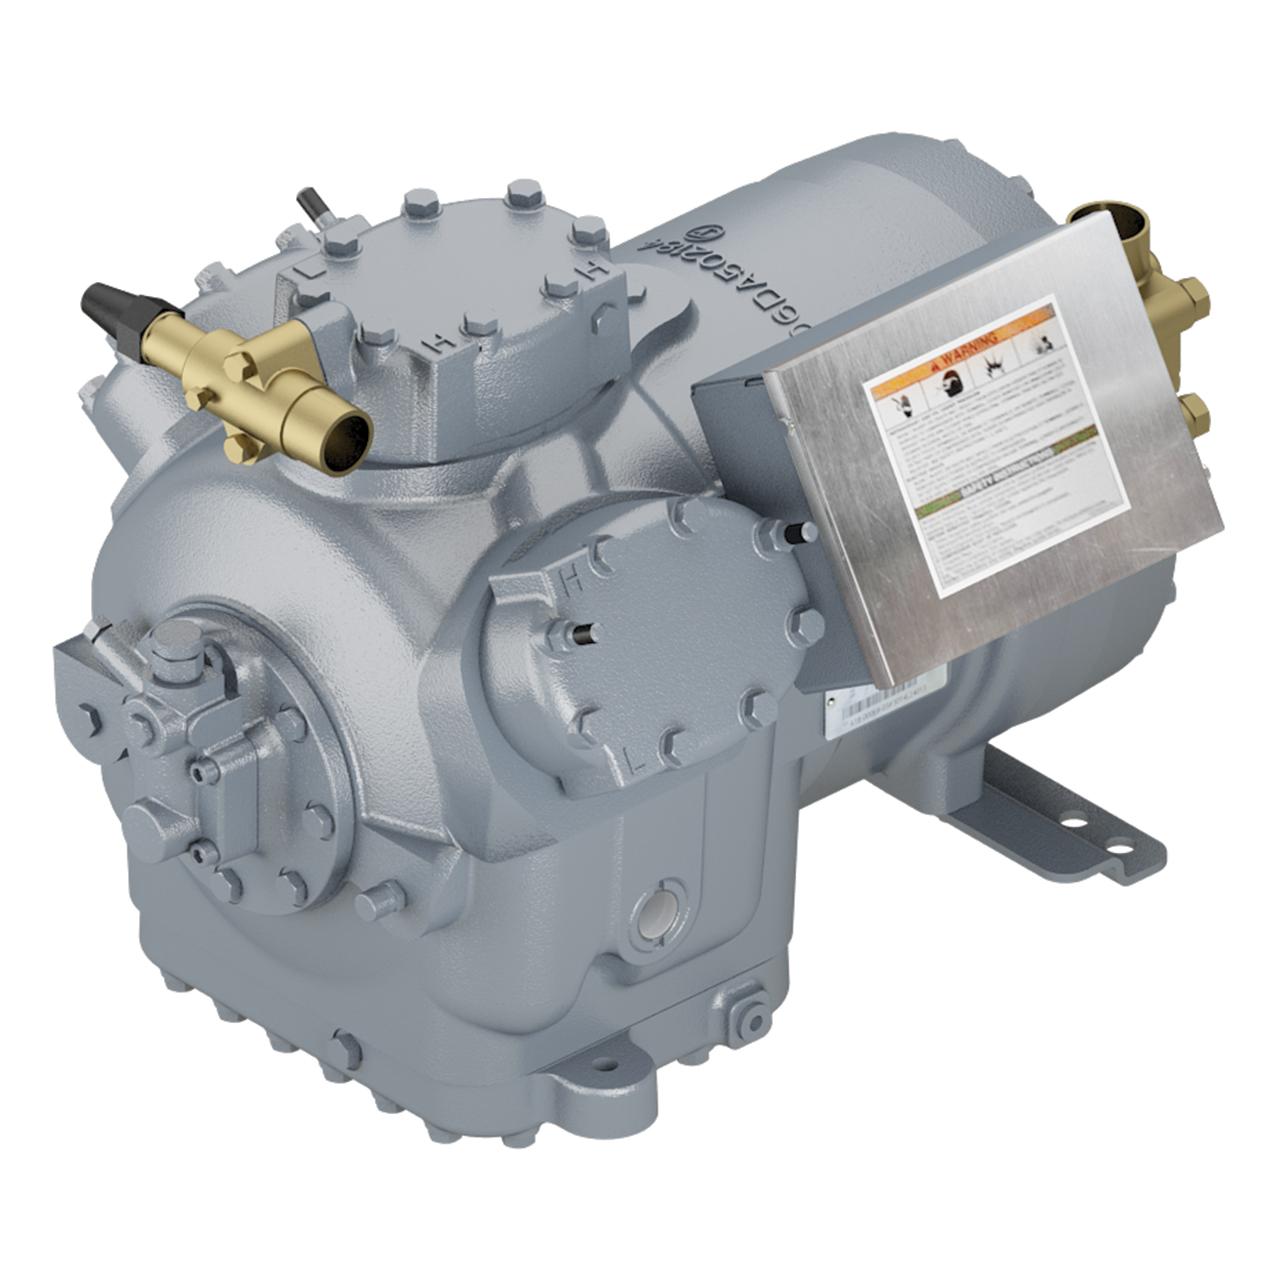 carlyle-compressor-06d